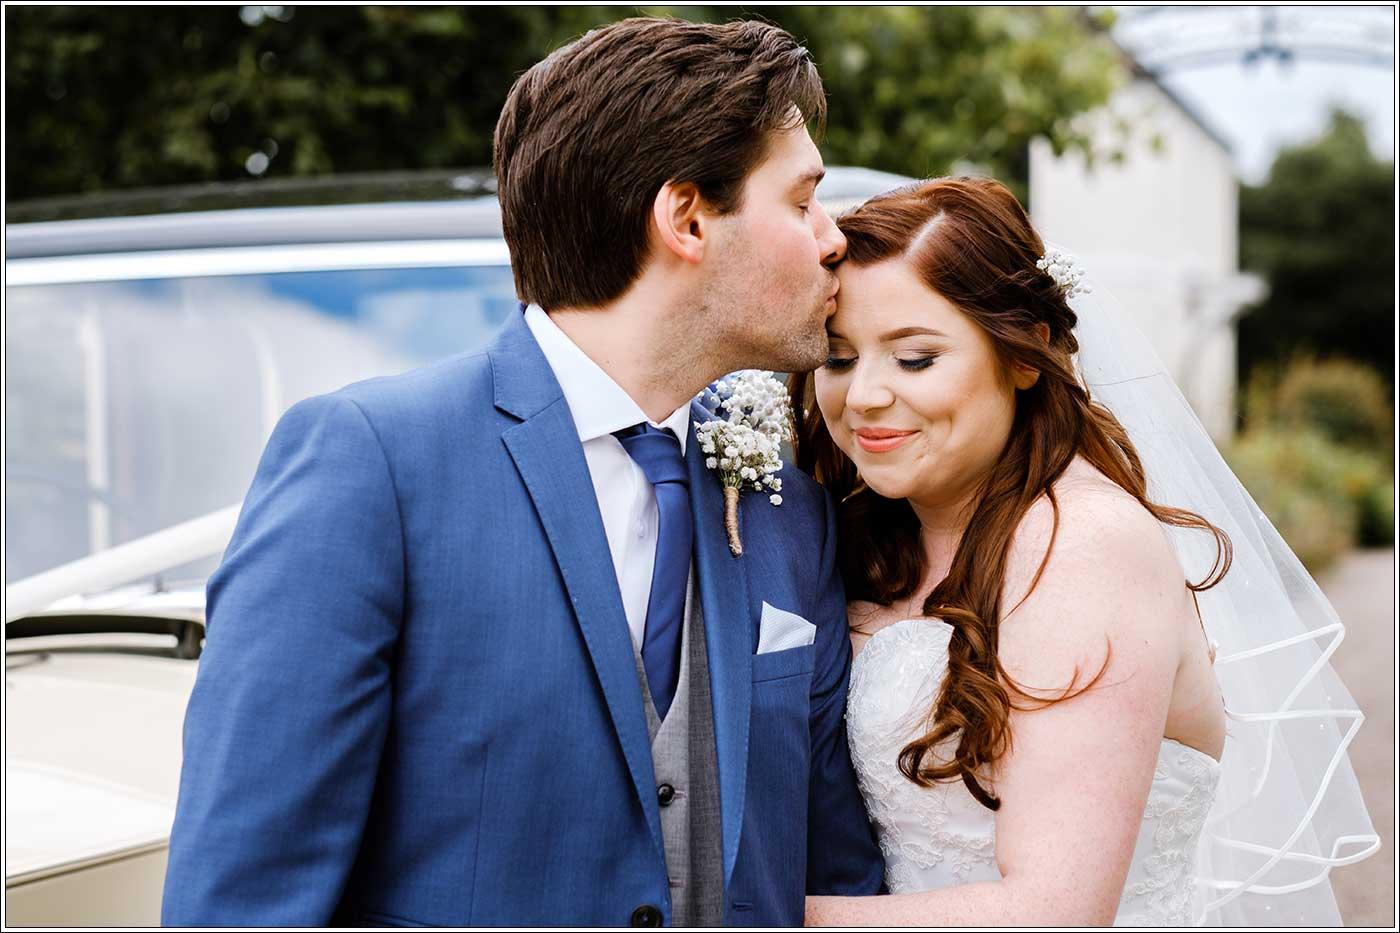 Groom kissing bride on her forehaed